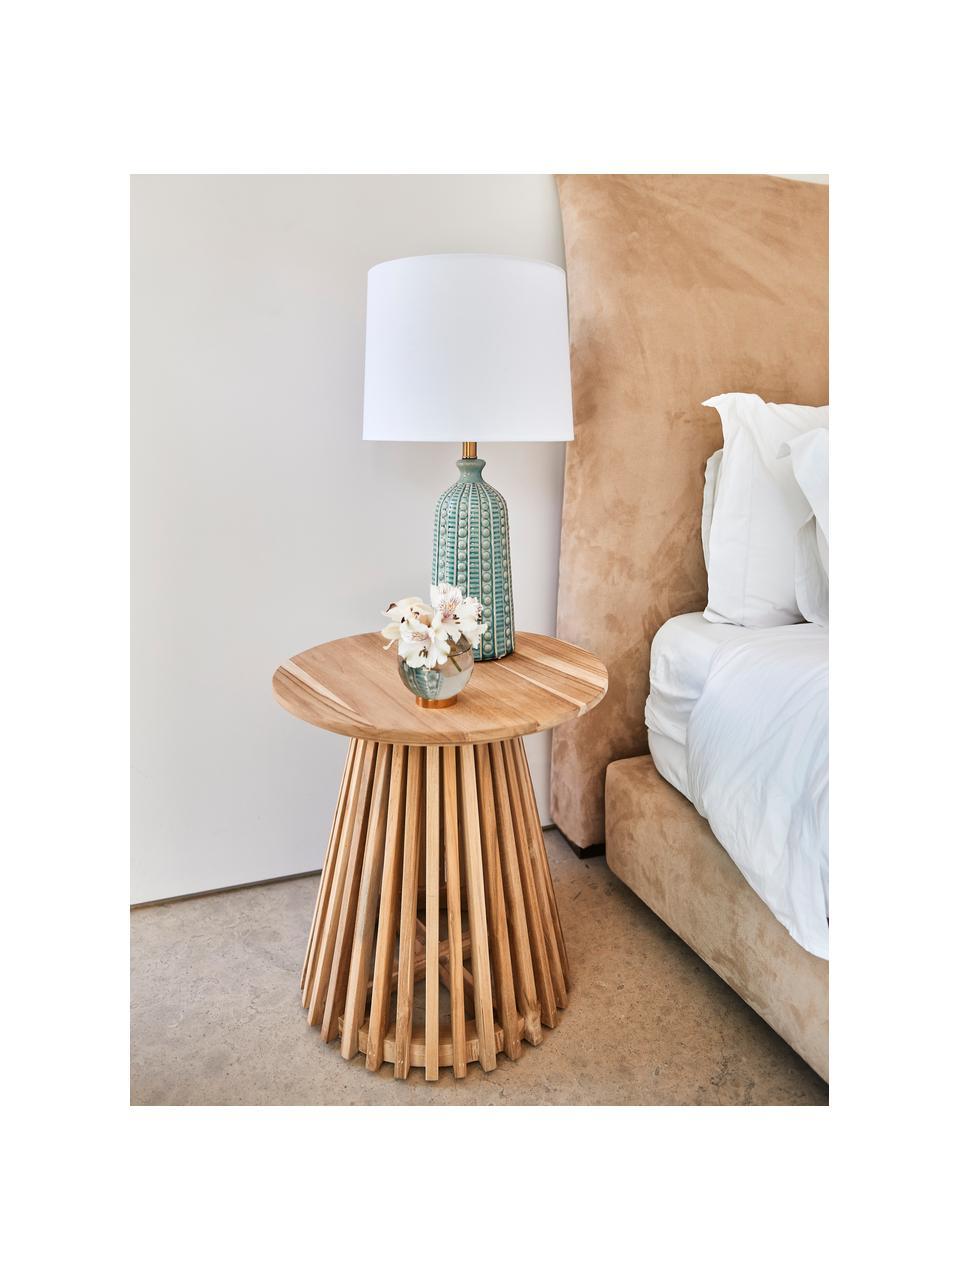 Große Keramik-Tischlampe Nizza in Salbeigrün, Lampenschirm: Textil, Lampenfuß: Keramik, Salbeigrün, Ø 33 x H 60 cm